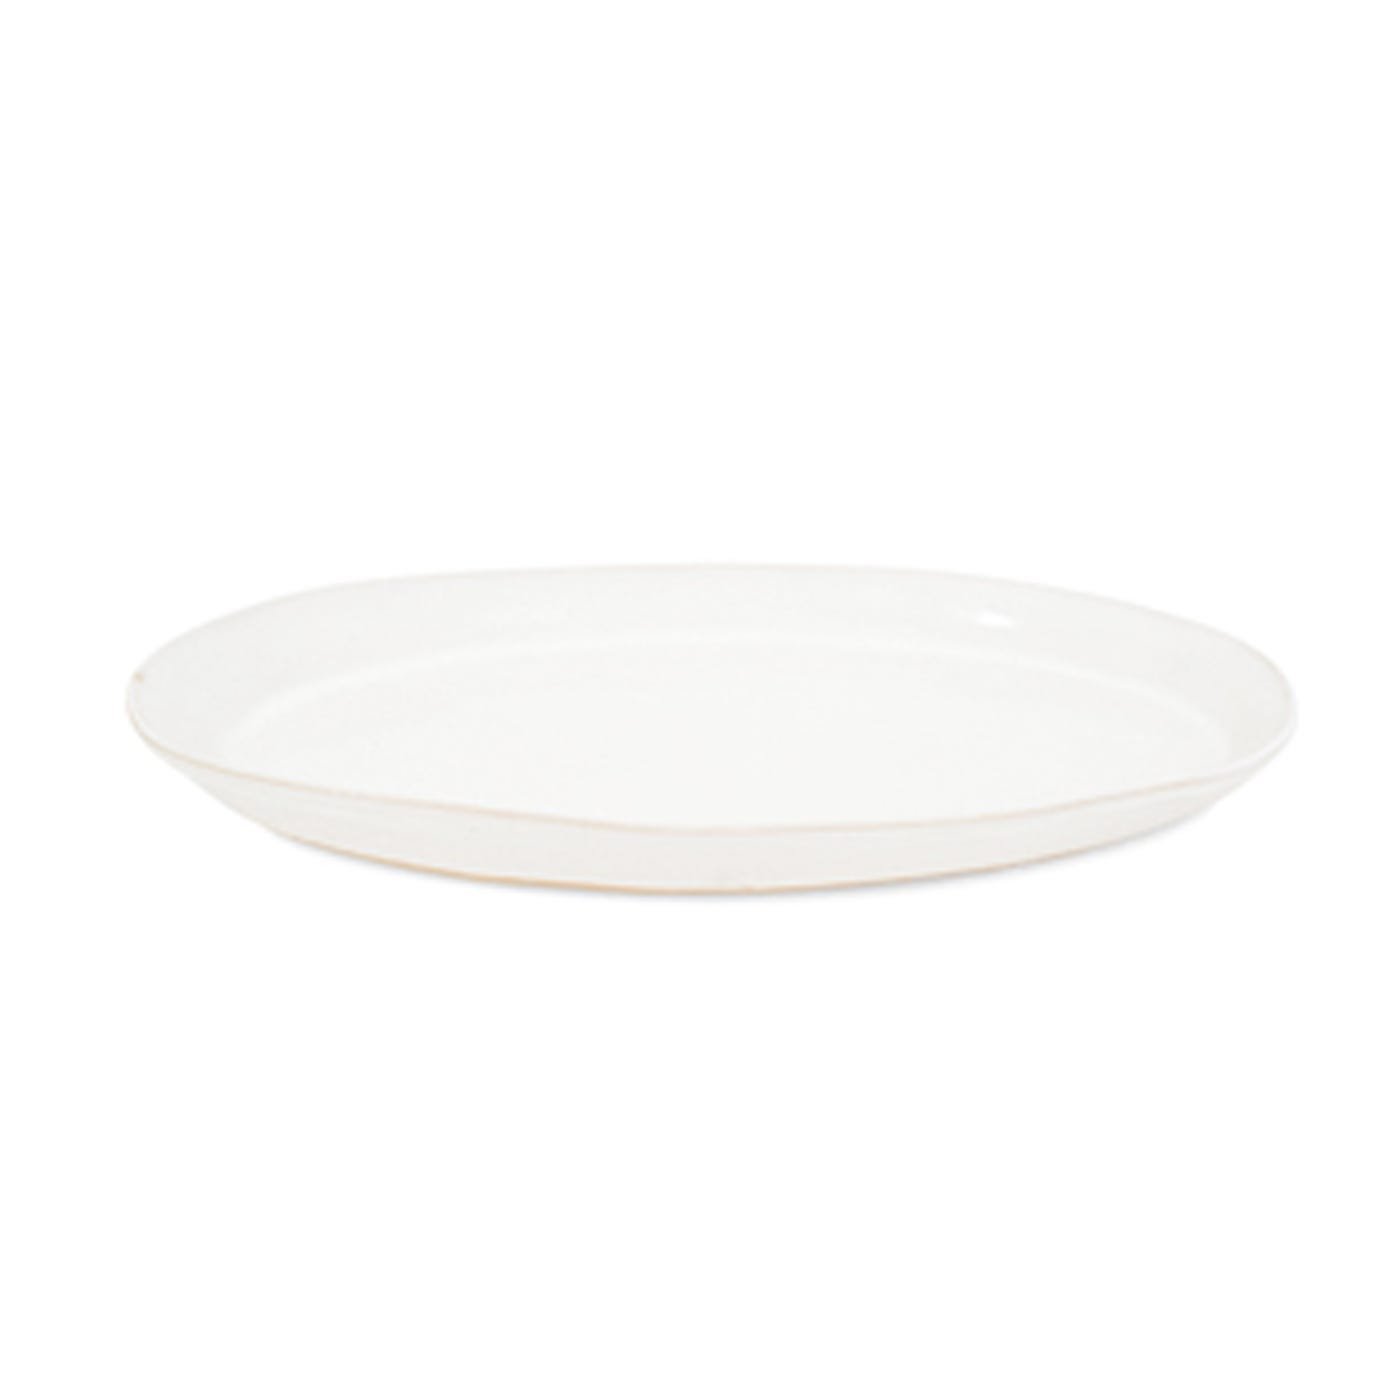 Shallow Round Platter White